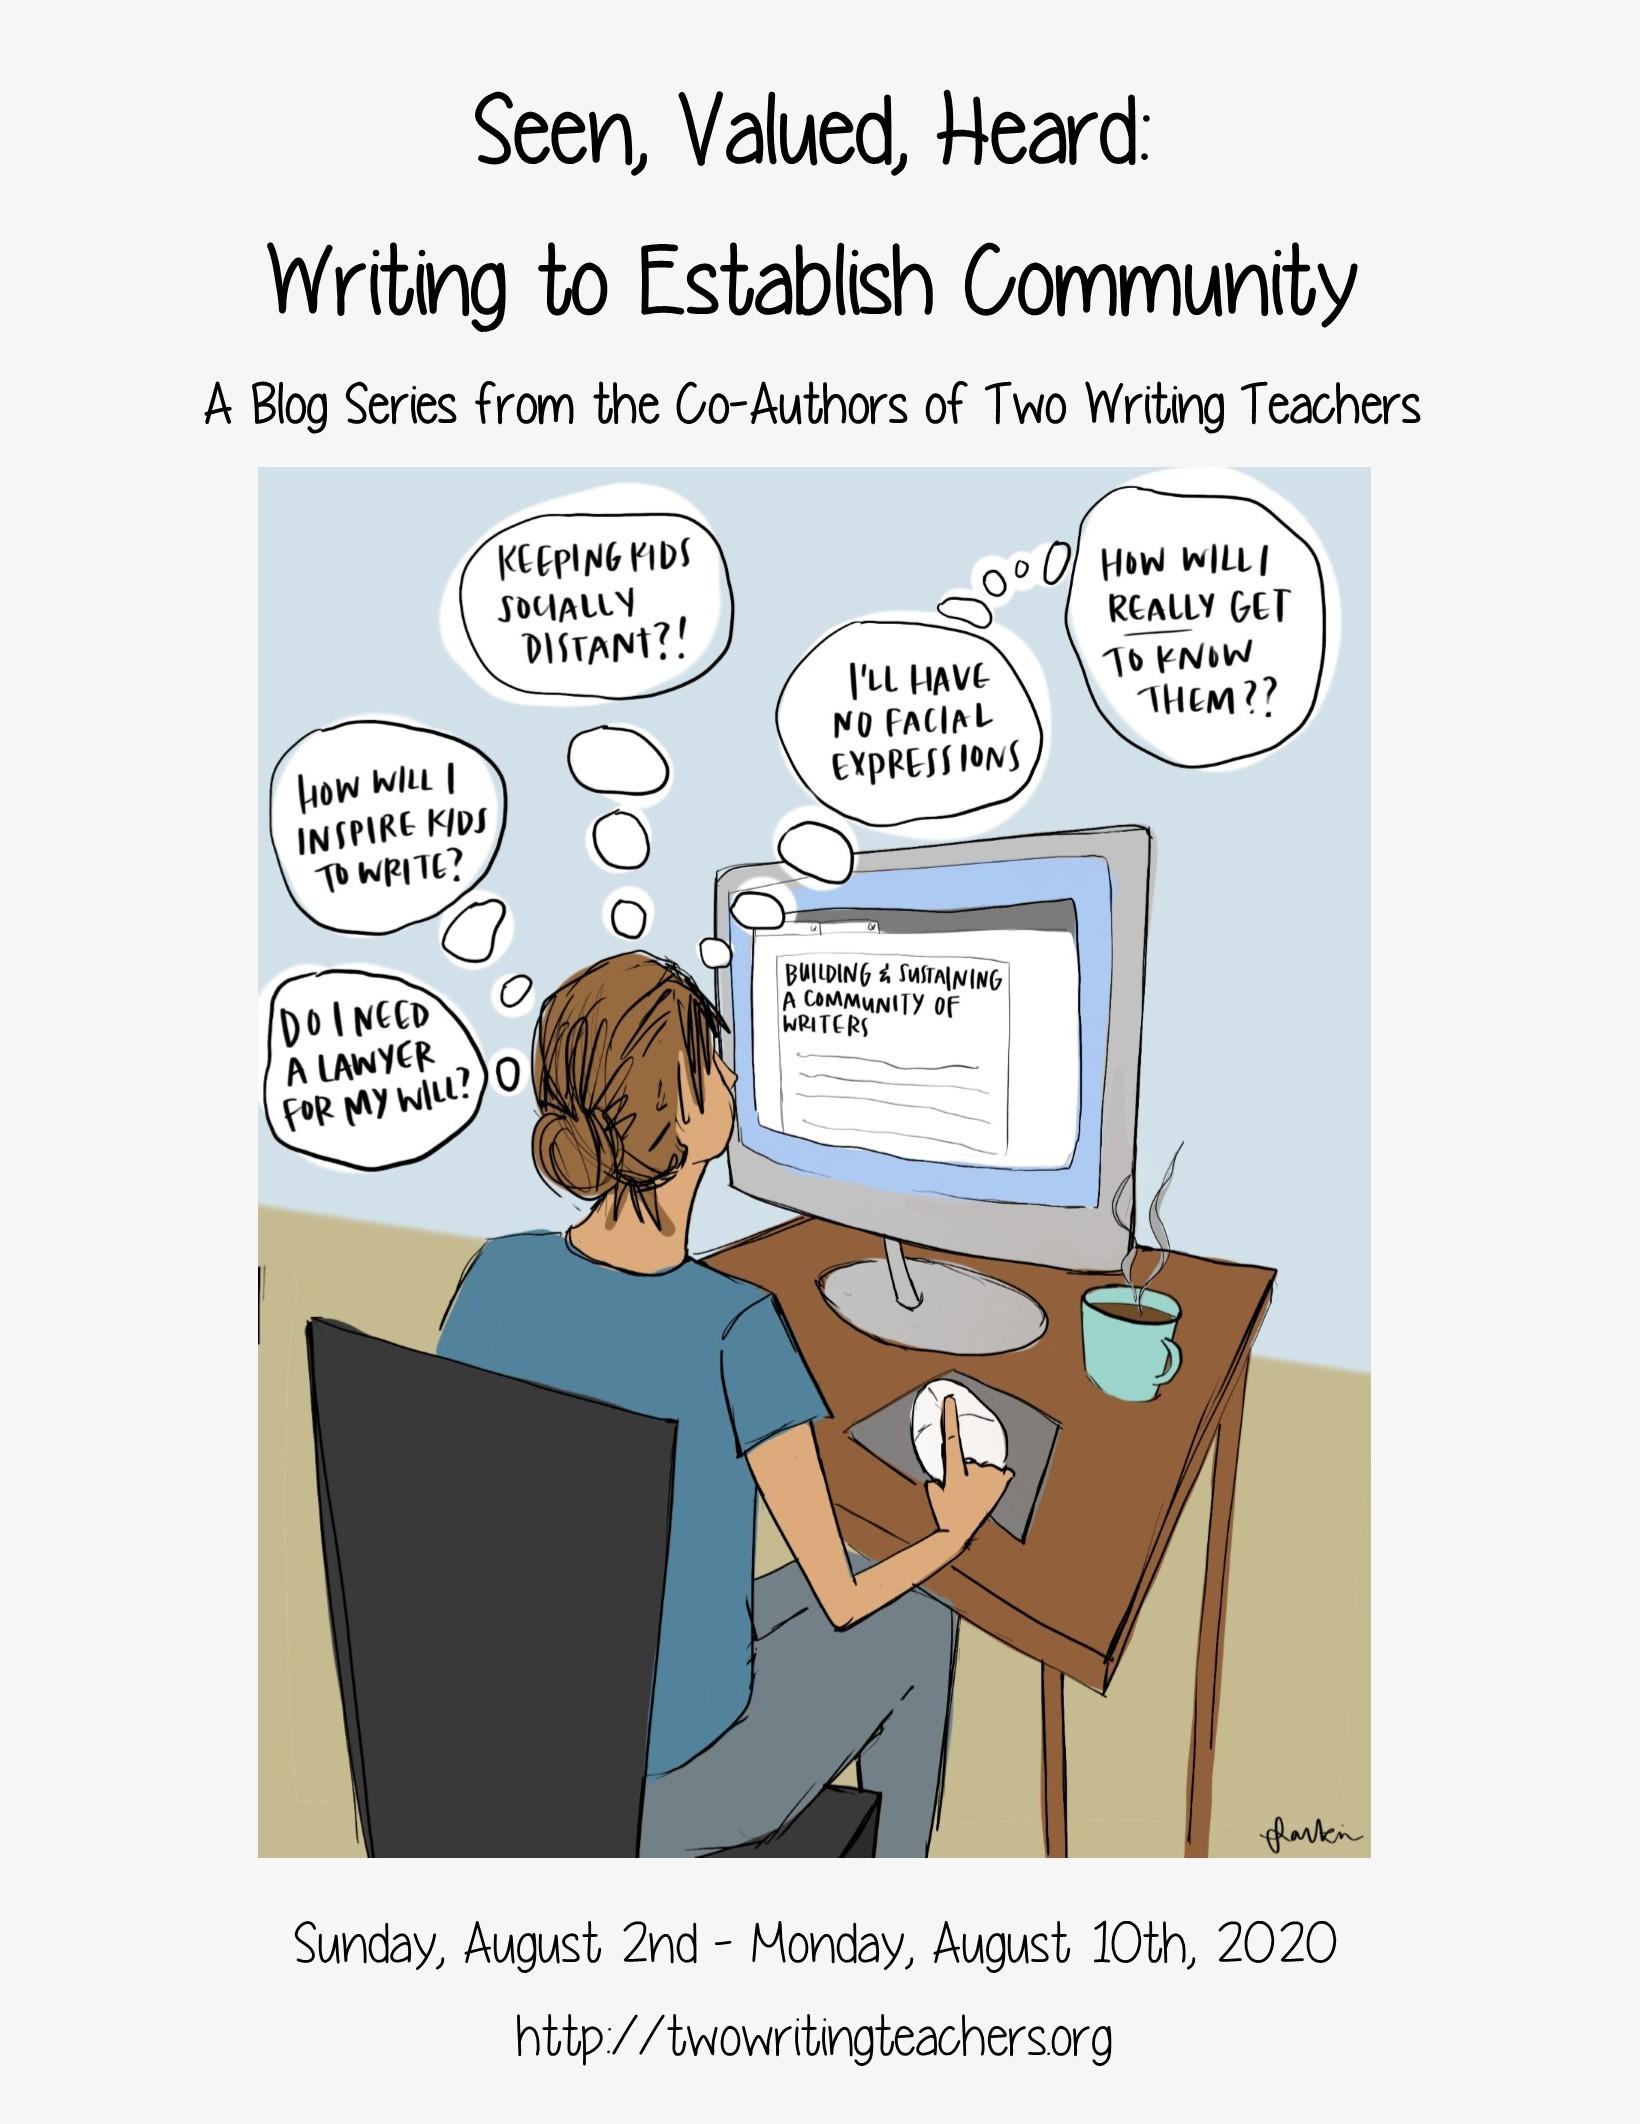 Seen, Valued, Heard: Writing Partnerships to Establish Community